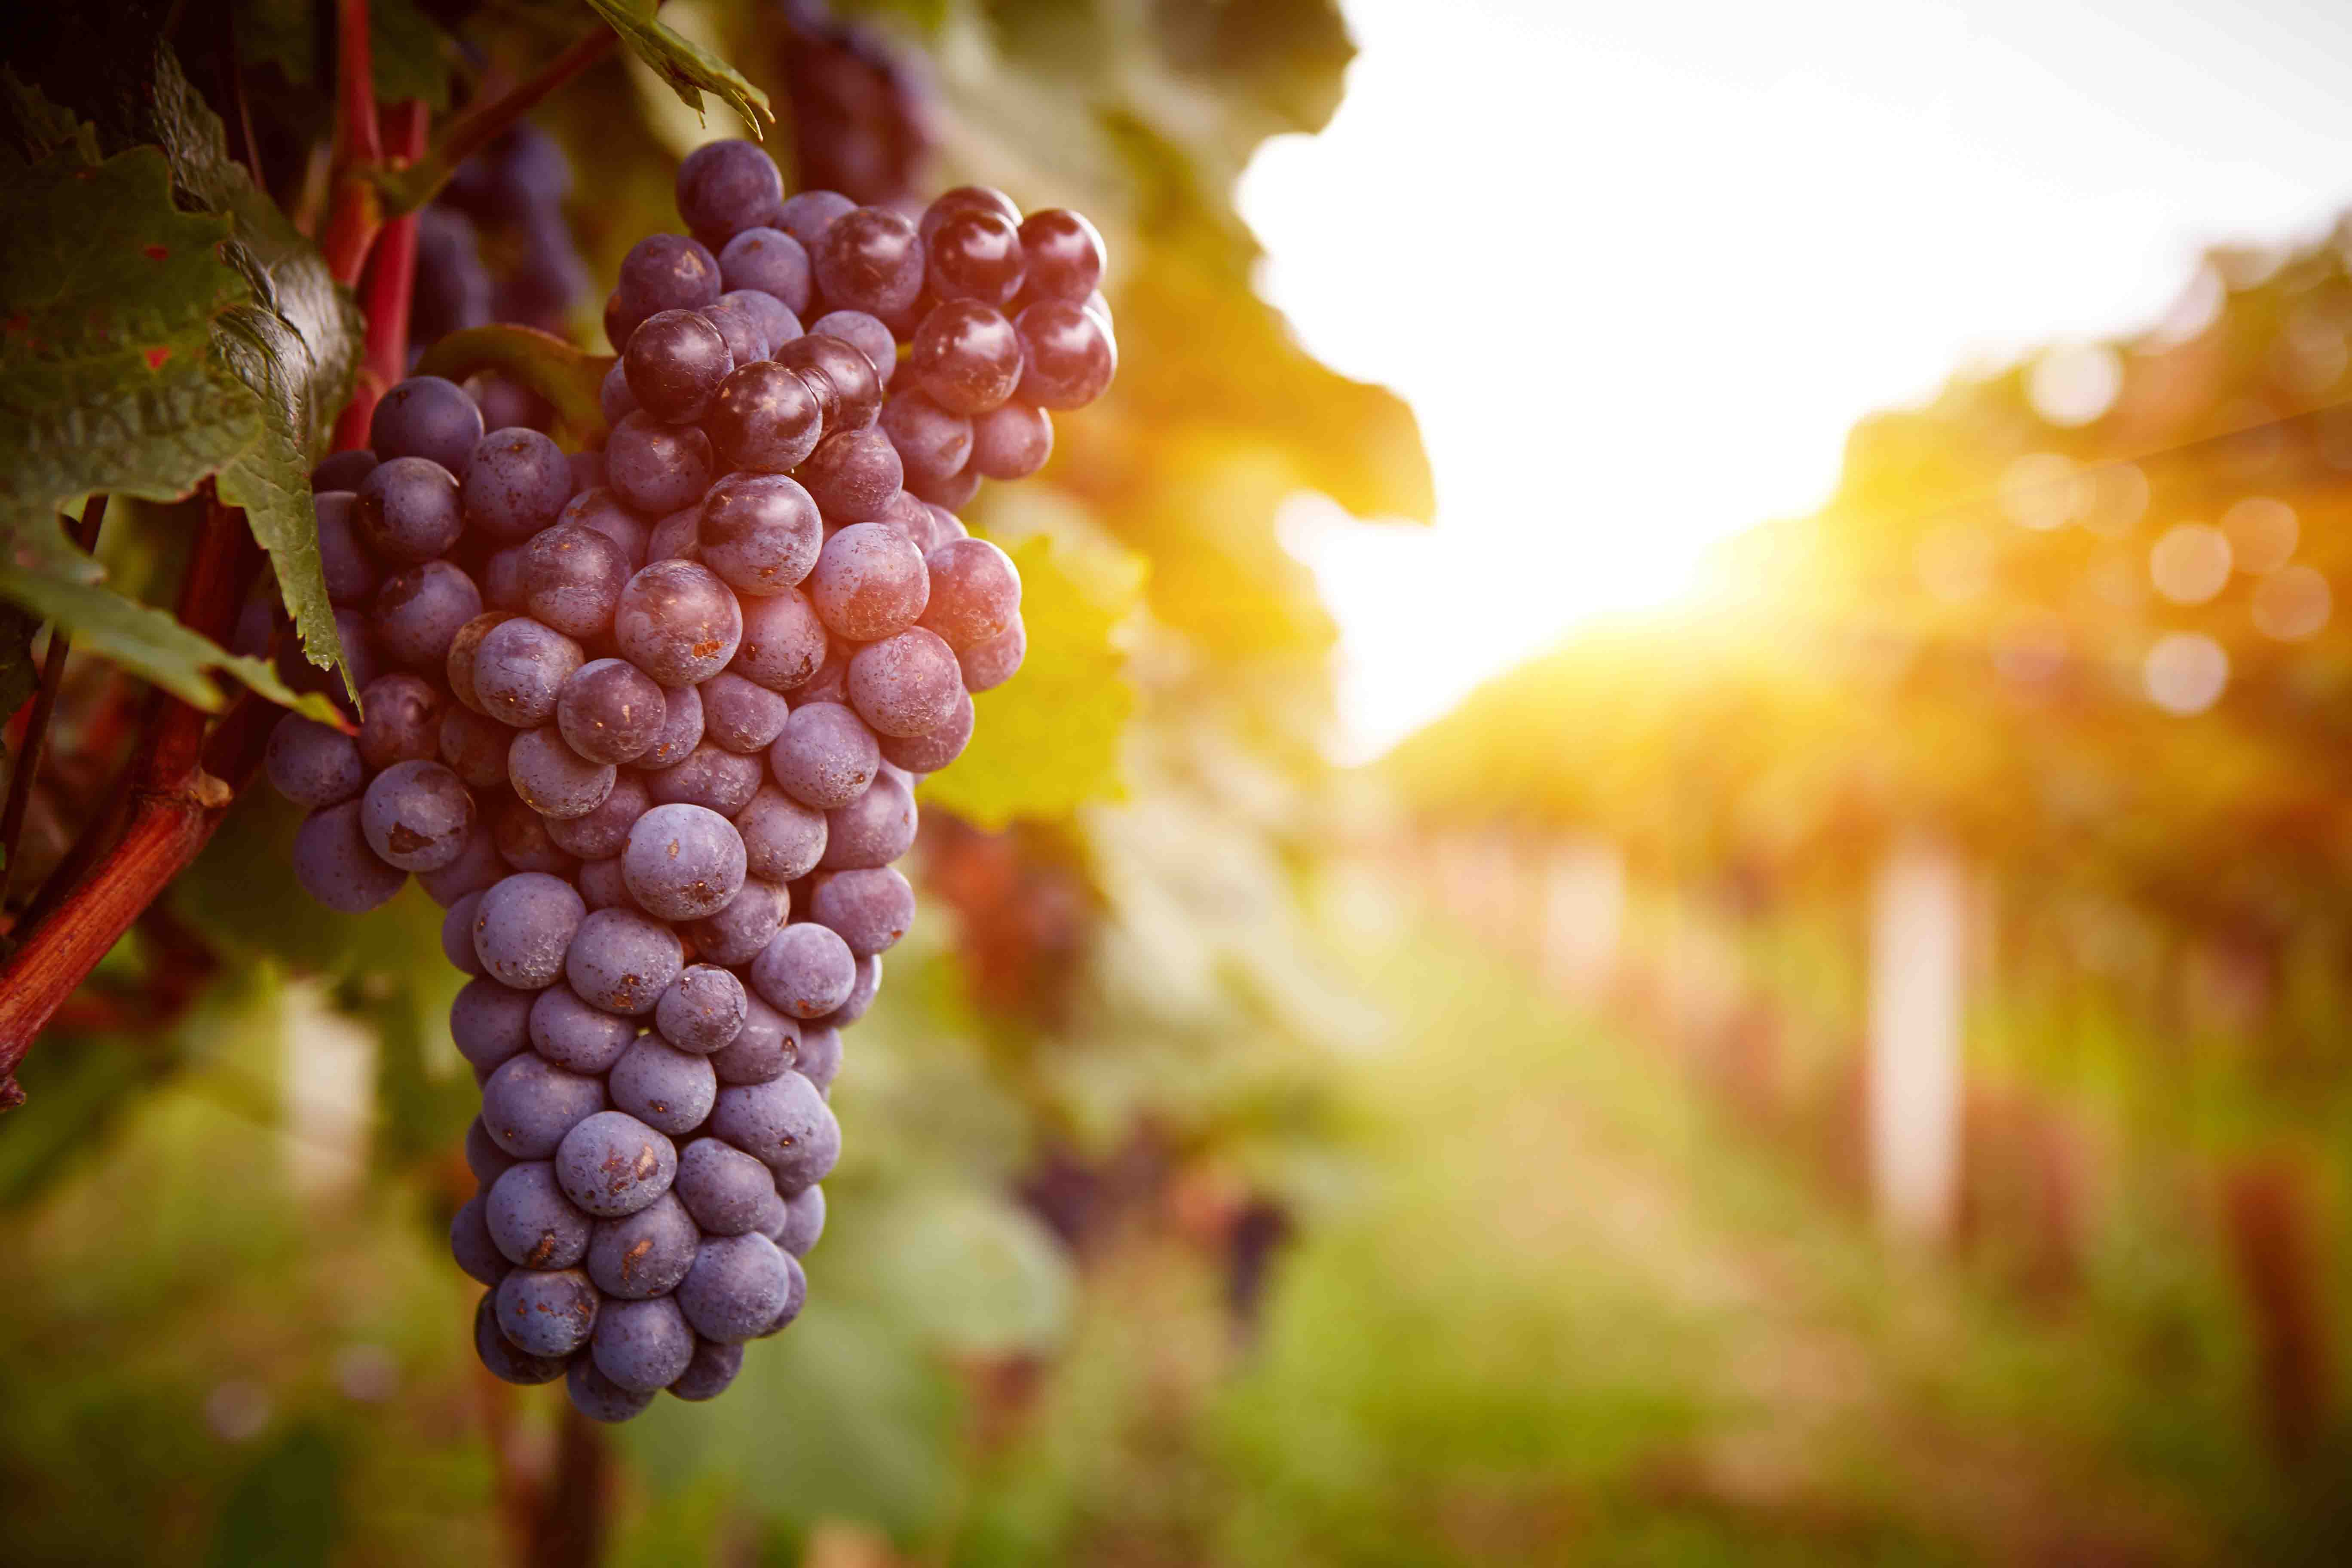 Ruta del vino de alicante enoturismo alicante record go - Stock uno alicante ...